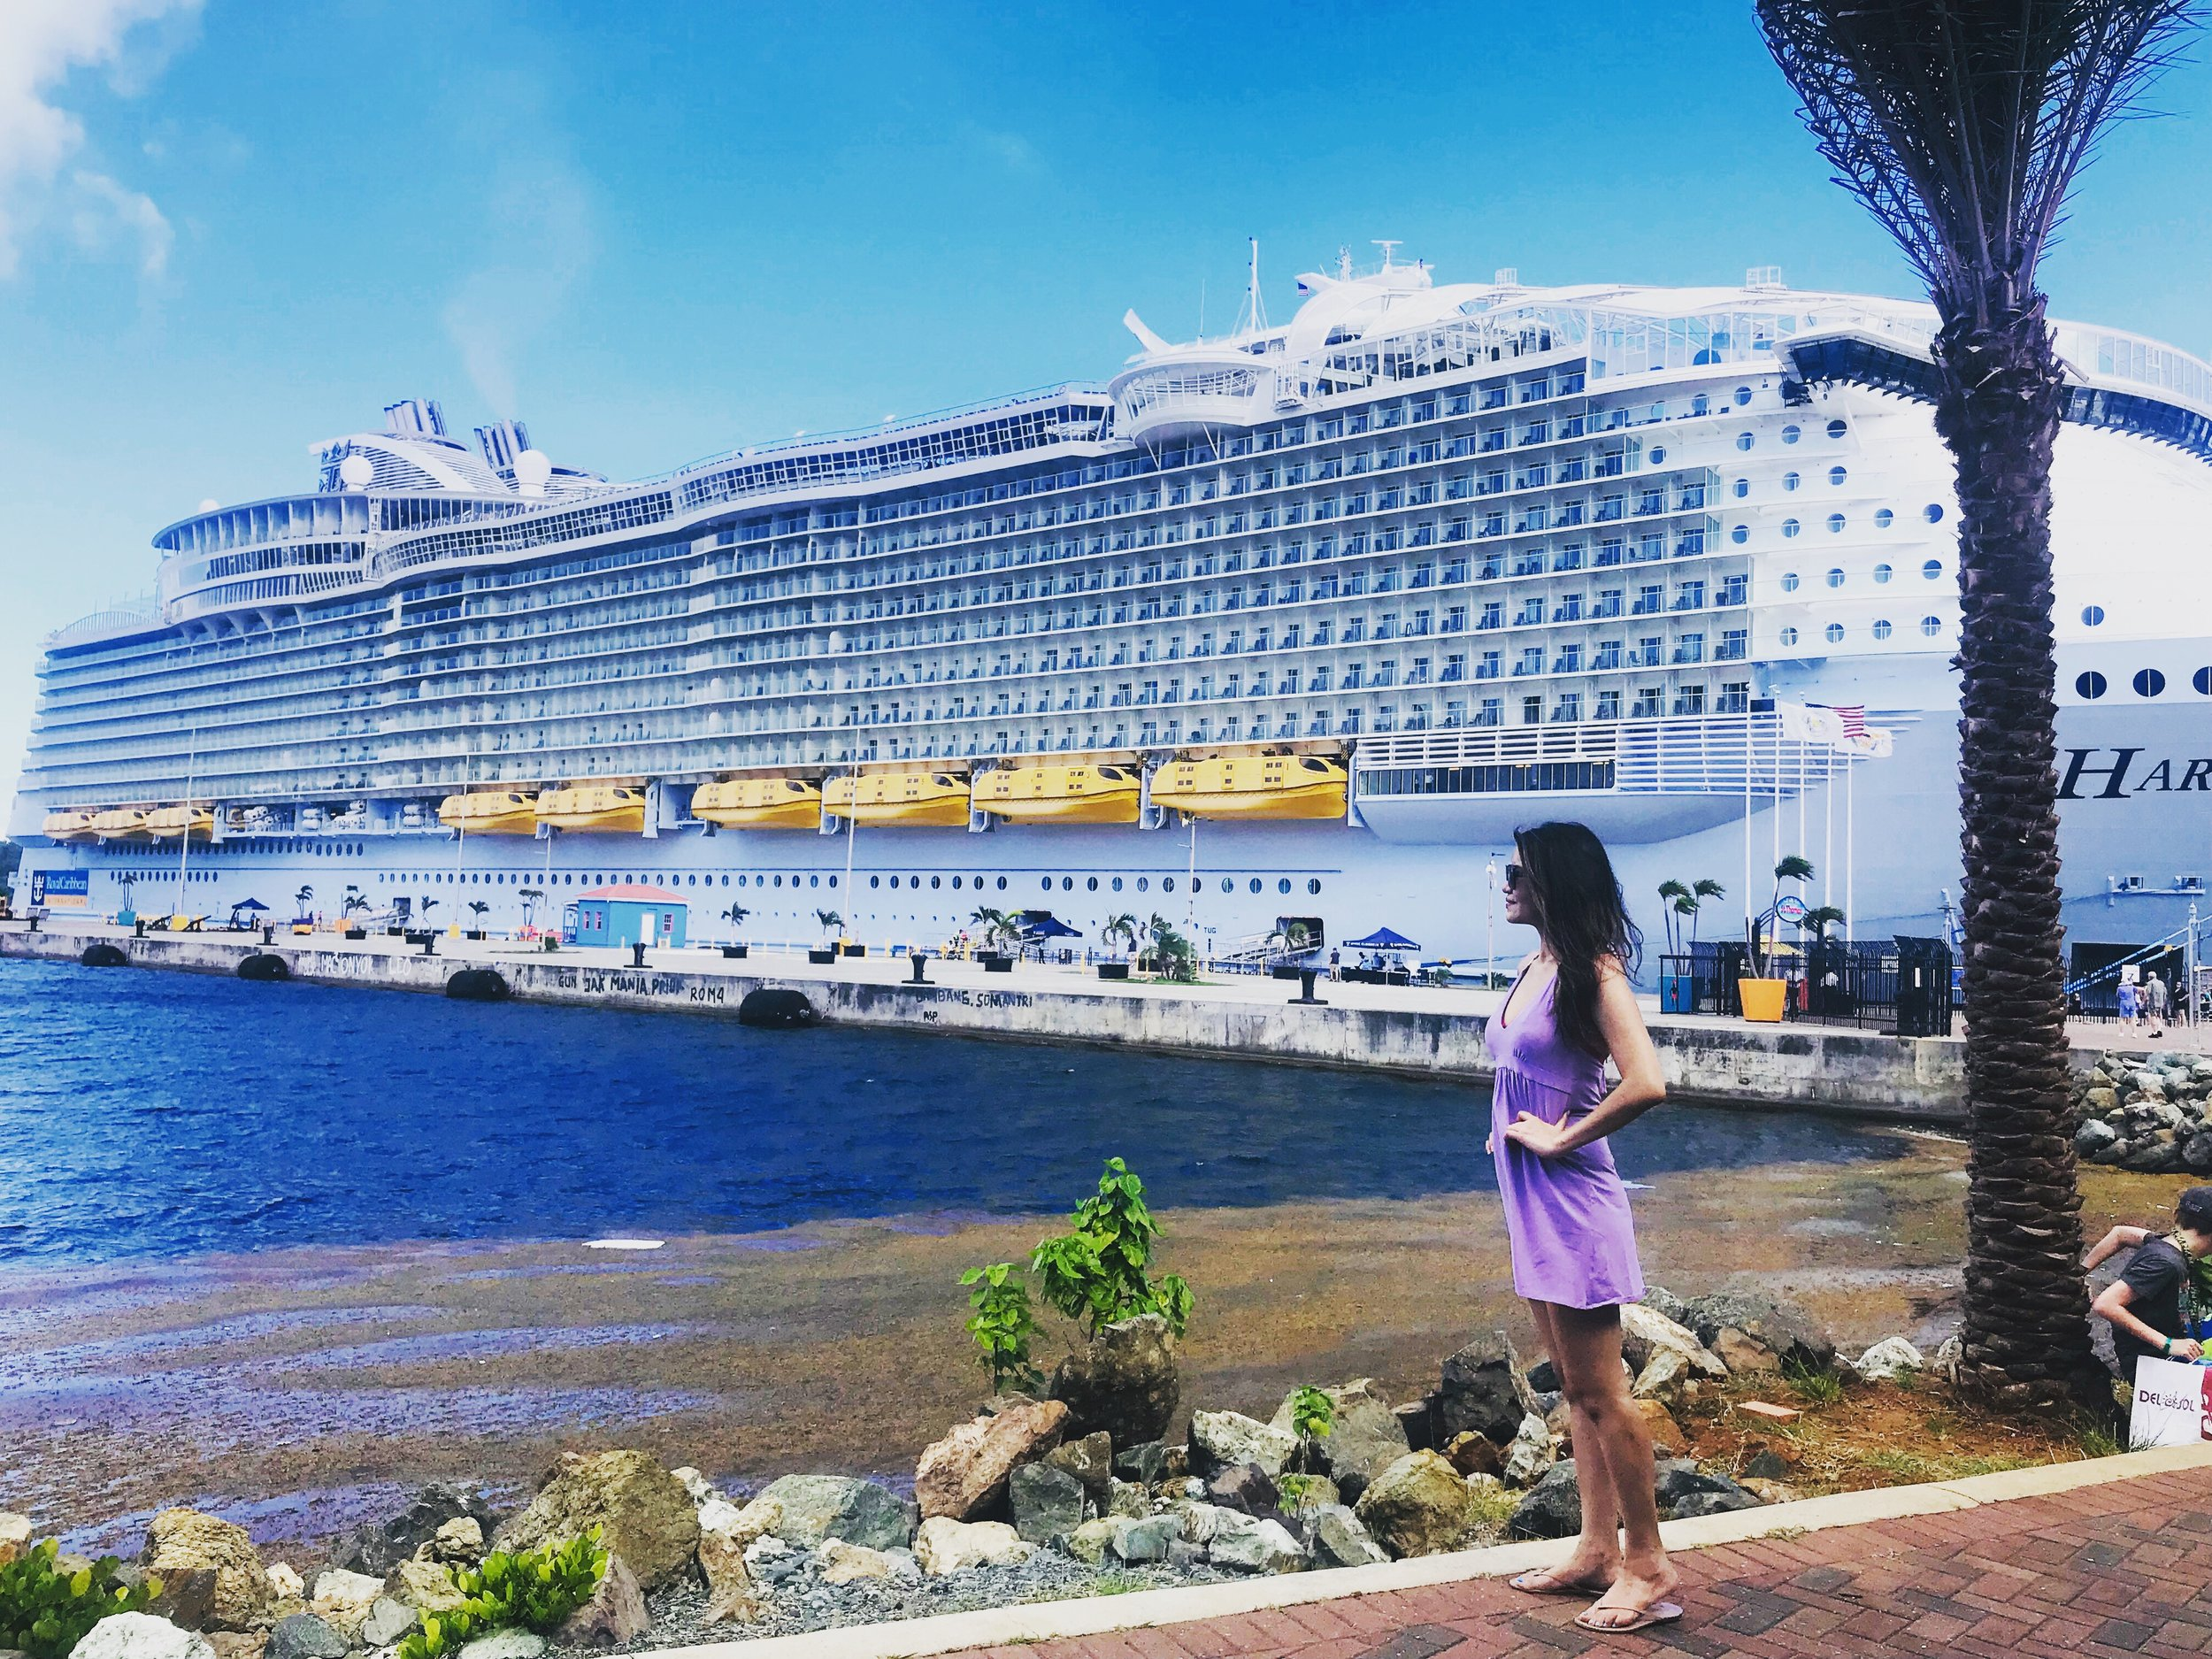 Crown Bay, Charlotte Amalie, St. Thomas, U.S. Virgin Island via Royal Caribbean's Harmony of the Seas | June 2019